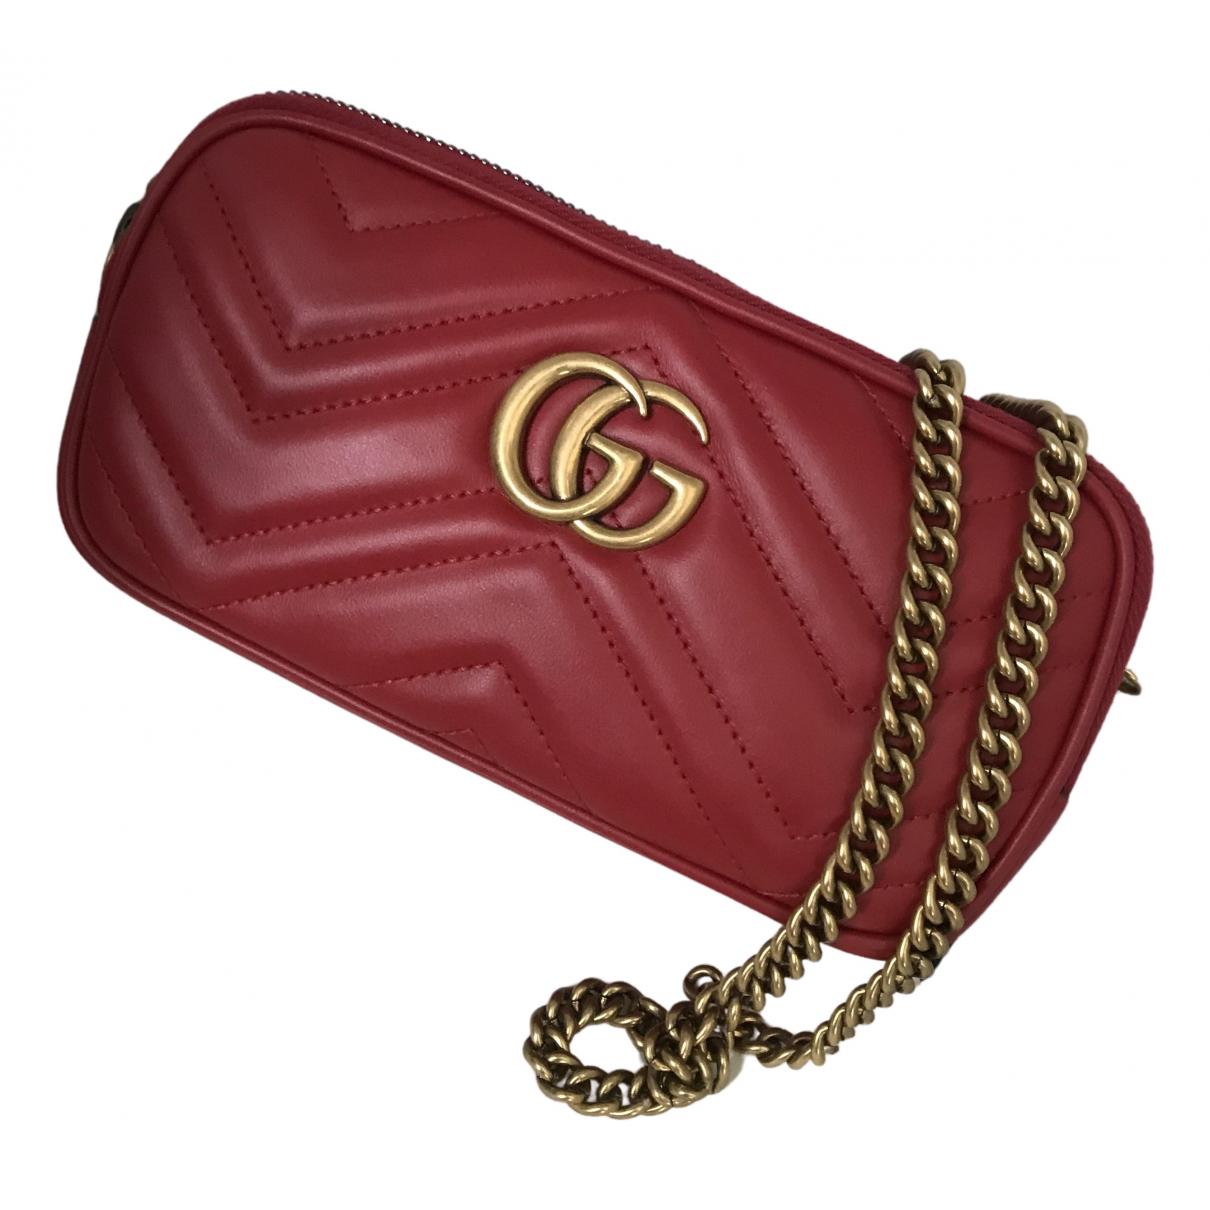 Gucci Marmont Handtasche in  Rot Leder